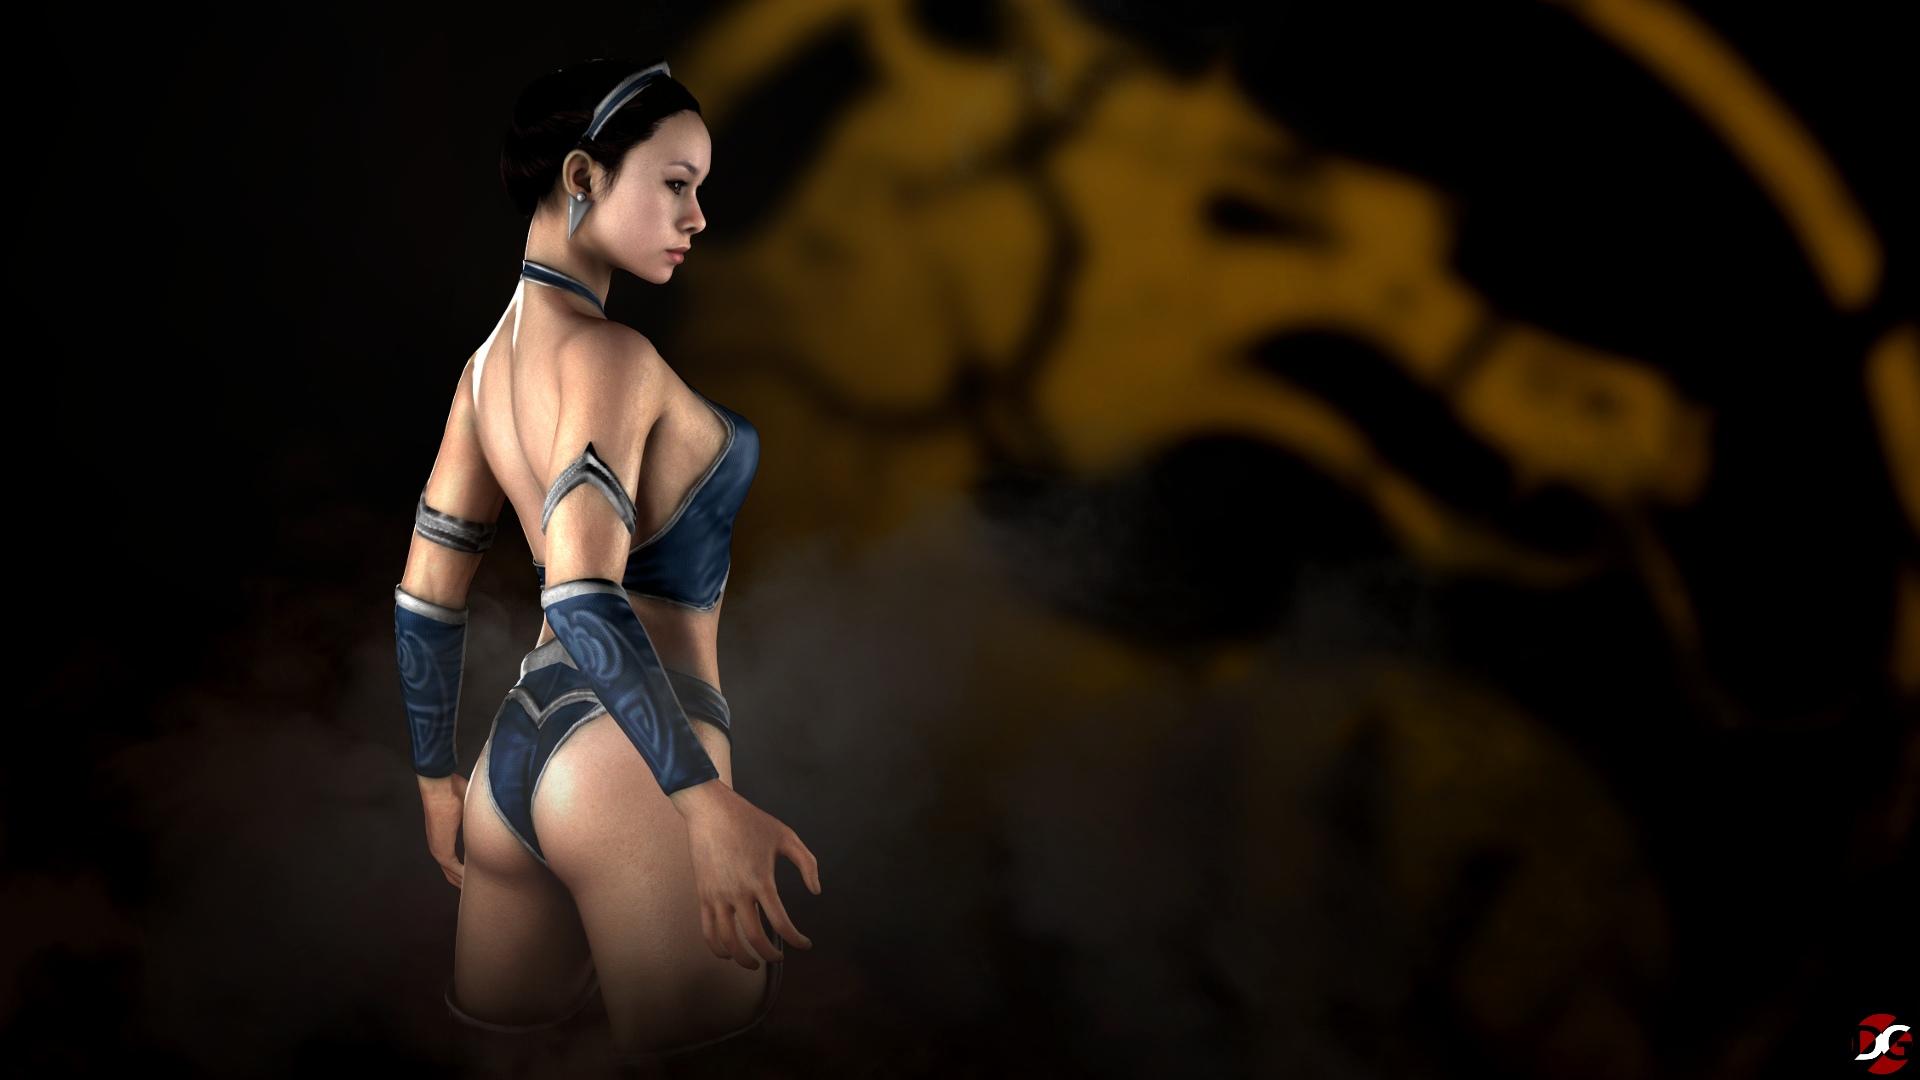 Mortal Kombat 11 Kitana